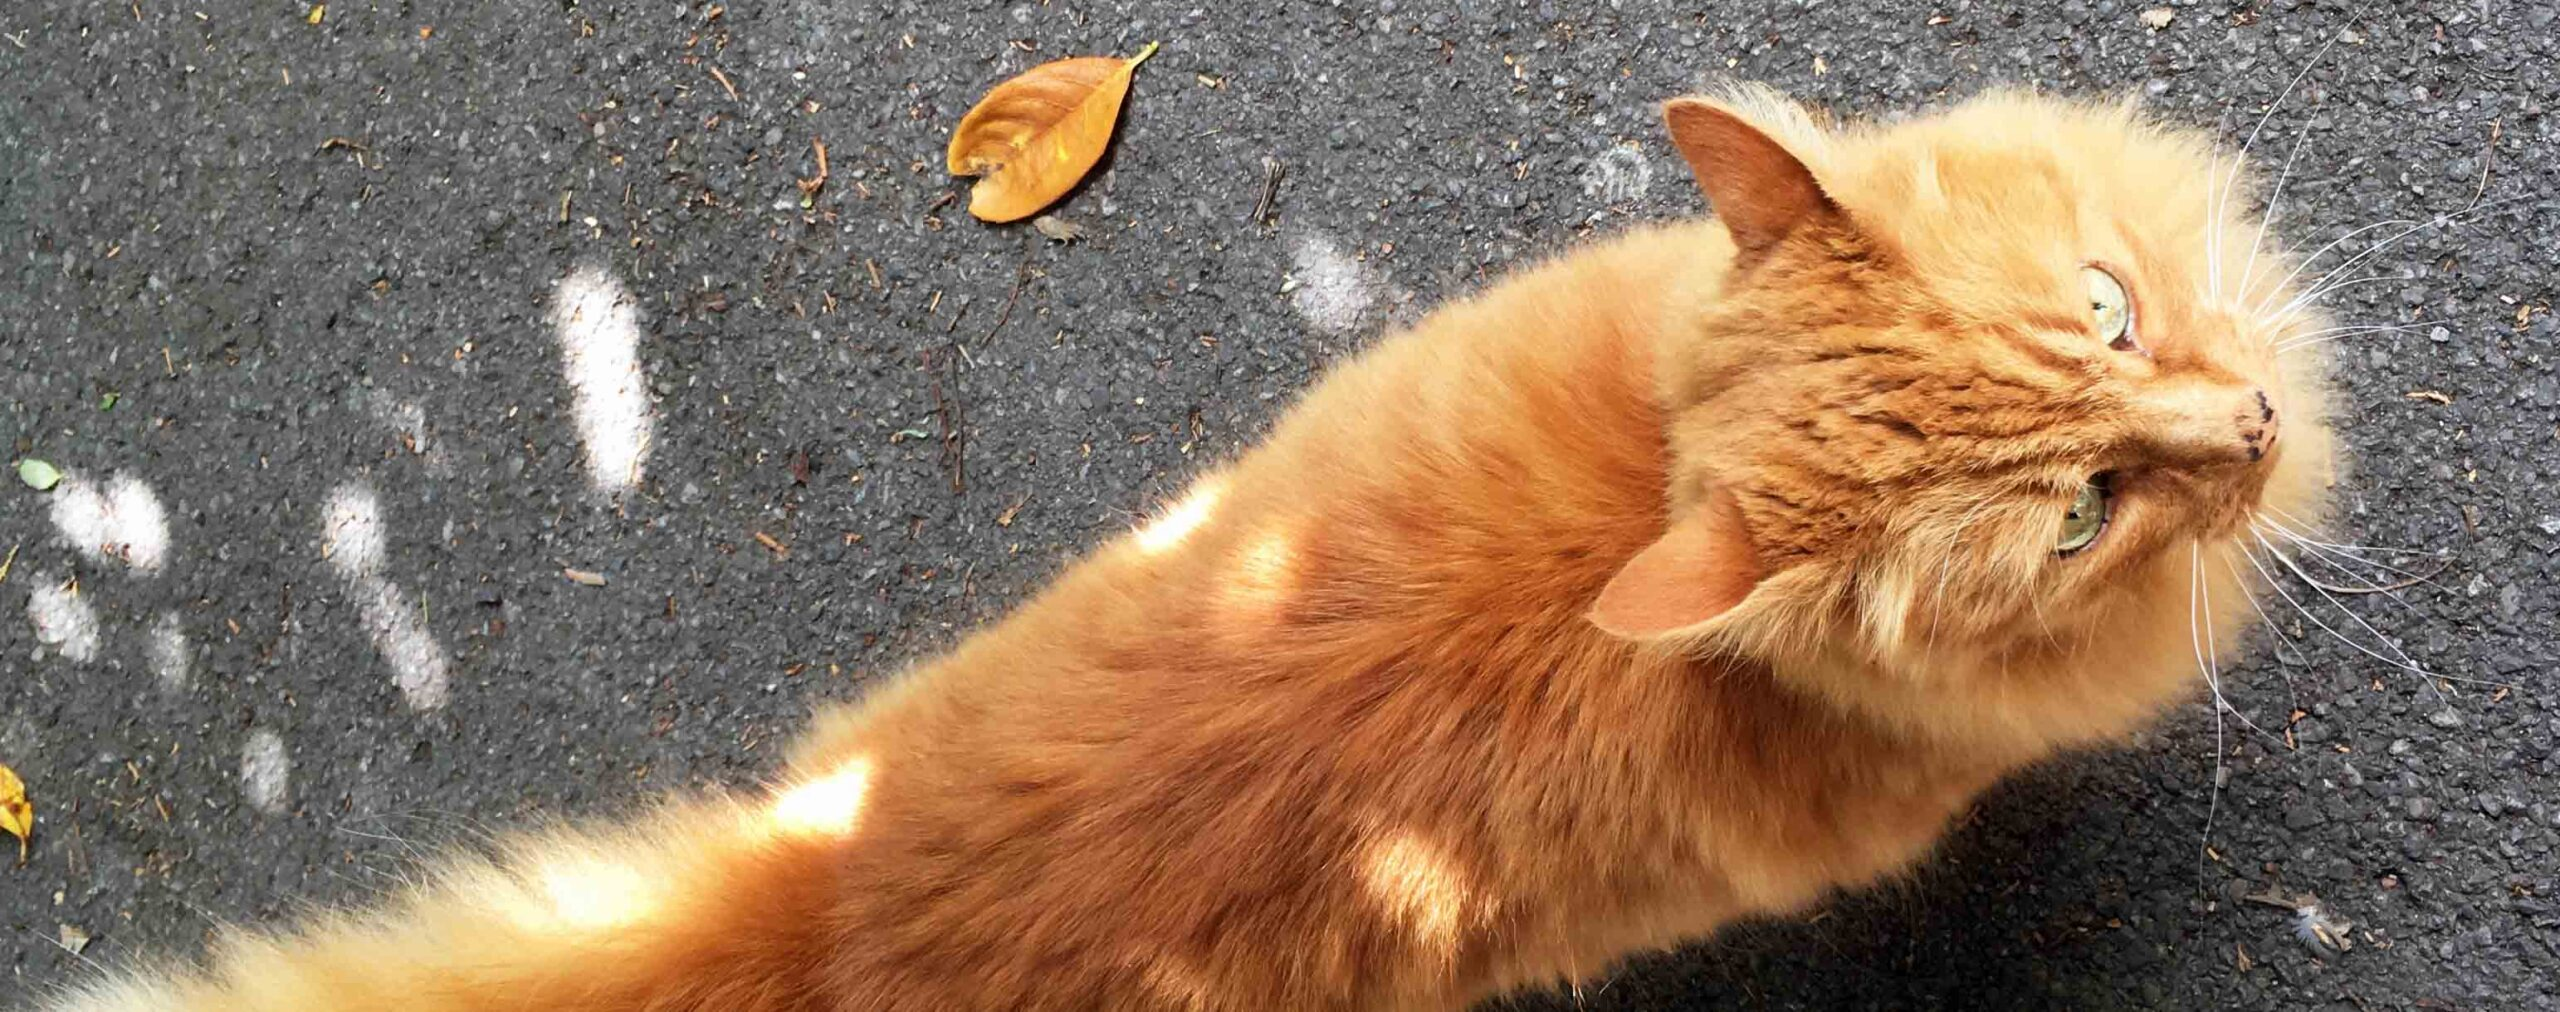 The ginger cat of Morrris Lane